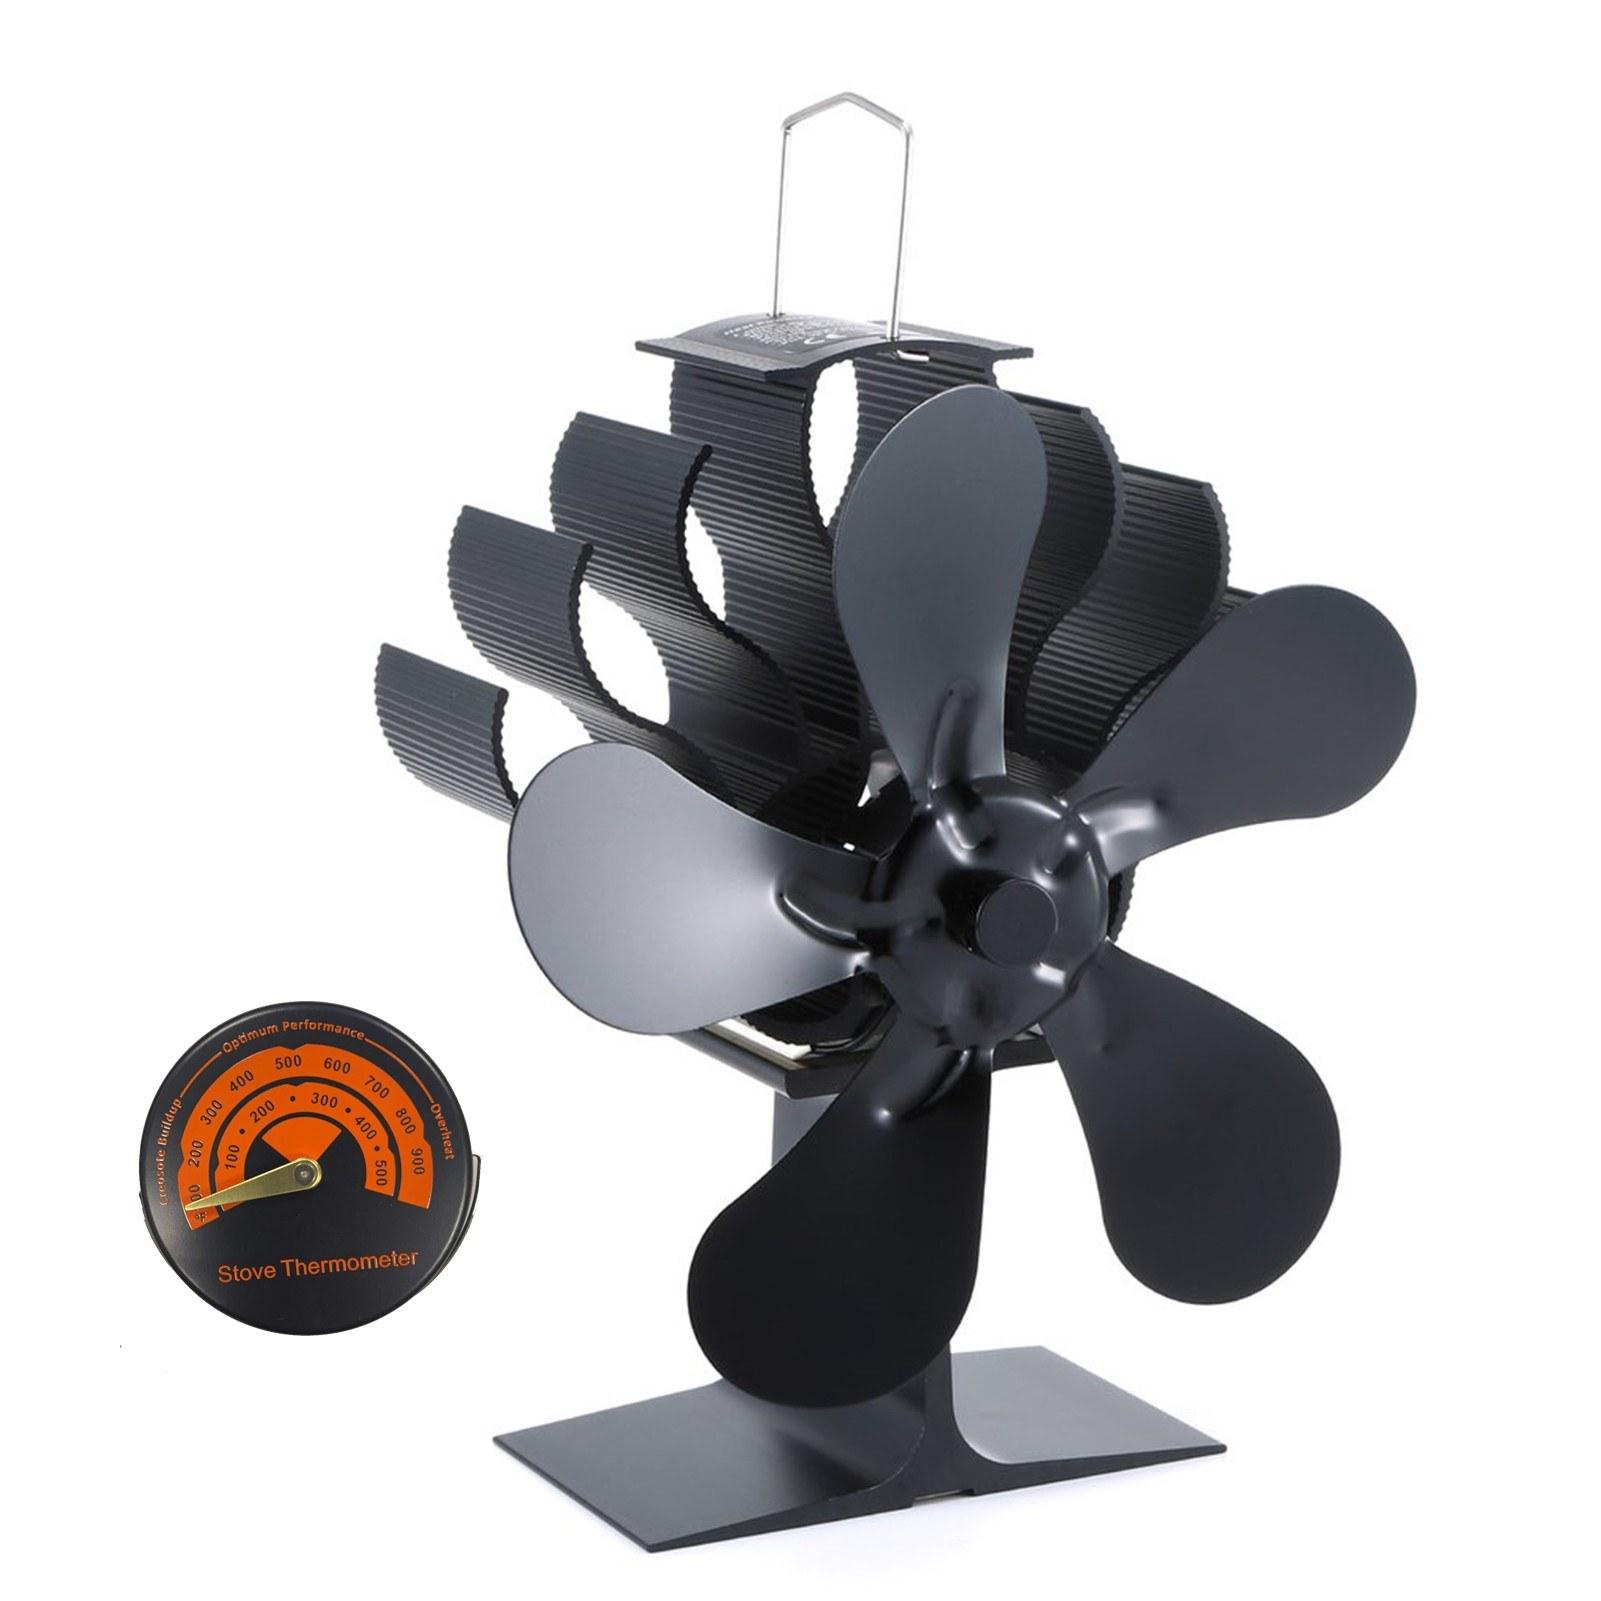 tomtop.com - 60% OFF Fireplace Fan Heat Powered Aluminum Alloy Wood Stove Fan, $38.99 (Inclusive of VAT)